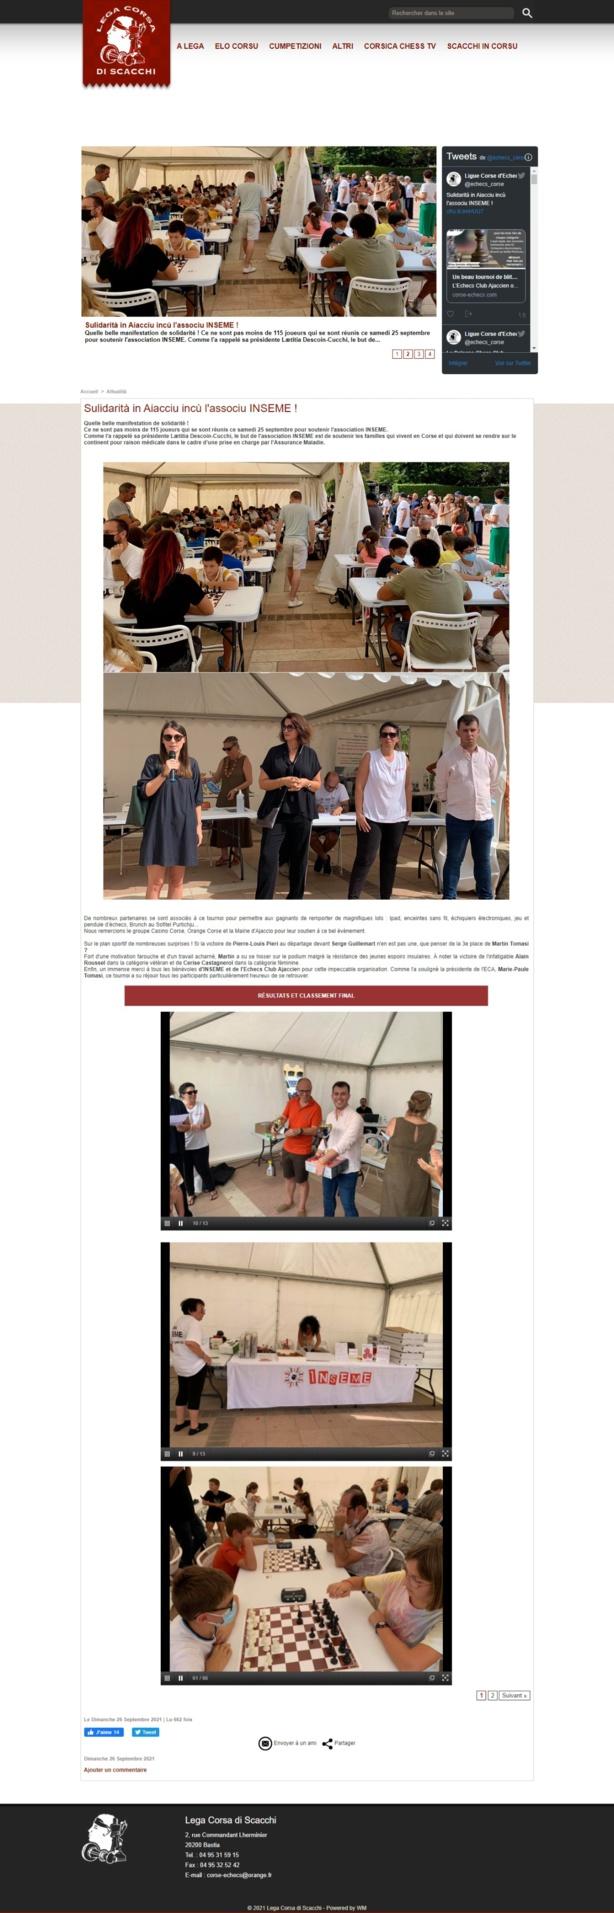 1er tournoi ECA INSEME 25/09/2021 Place du Diamant